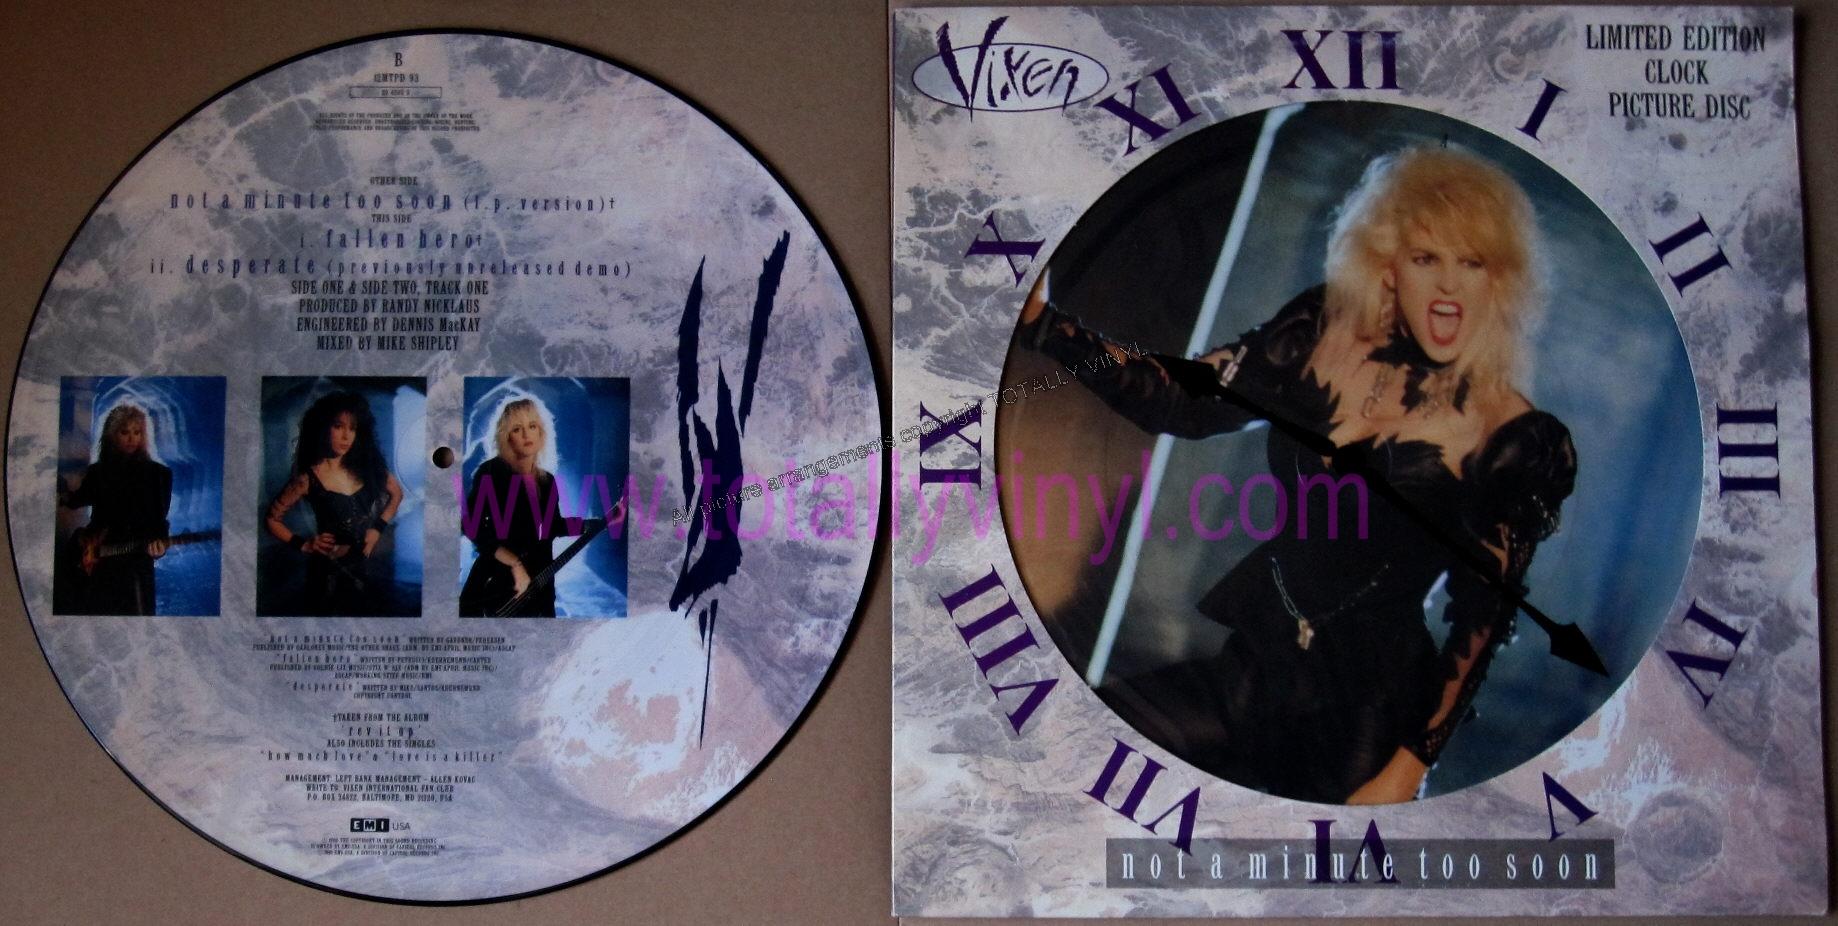 Totally Vinyl Records Vixen Not A Minute Too Soon Lp